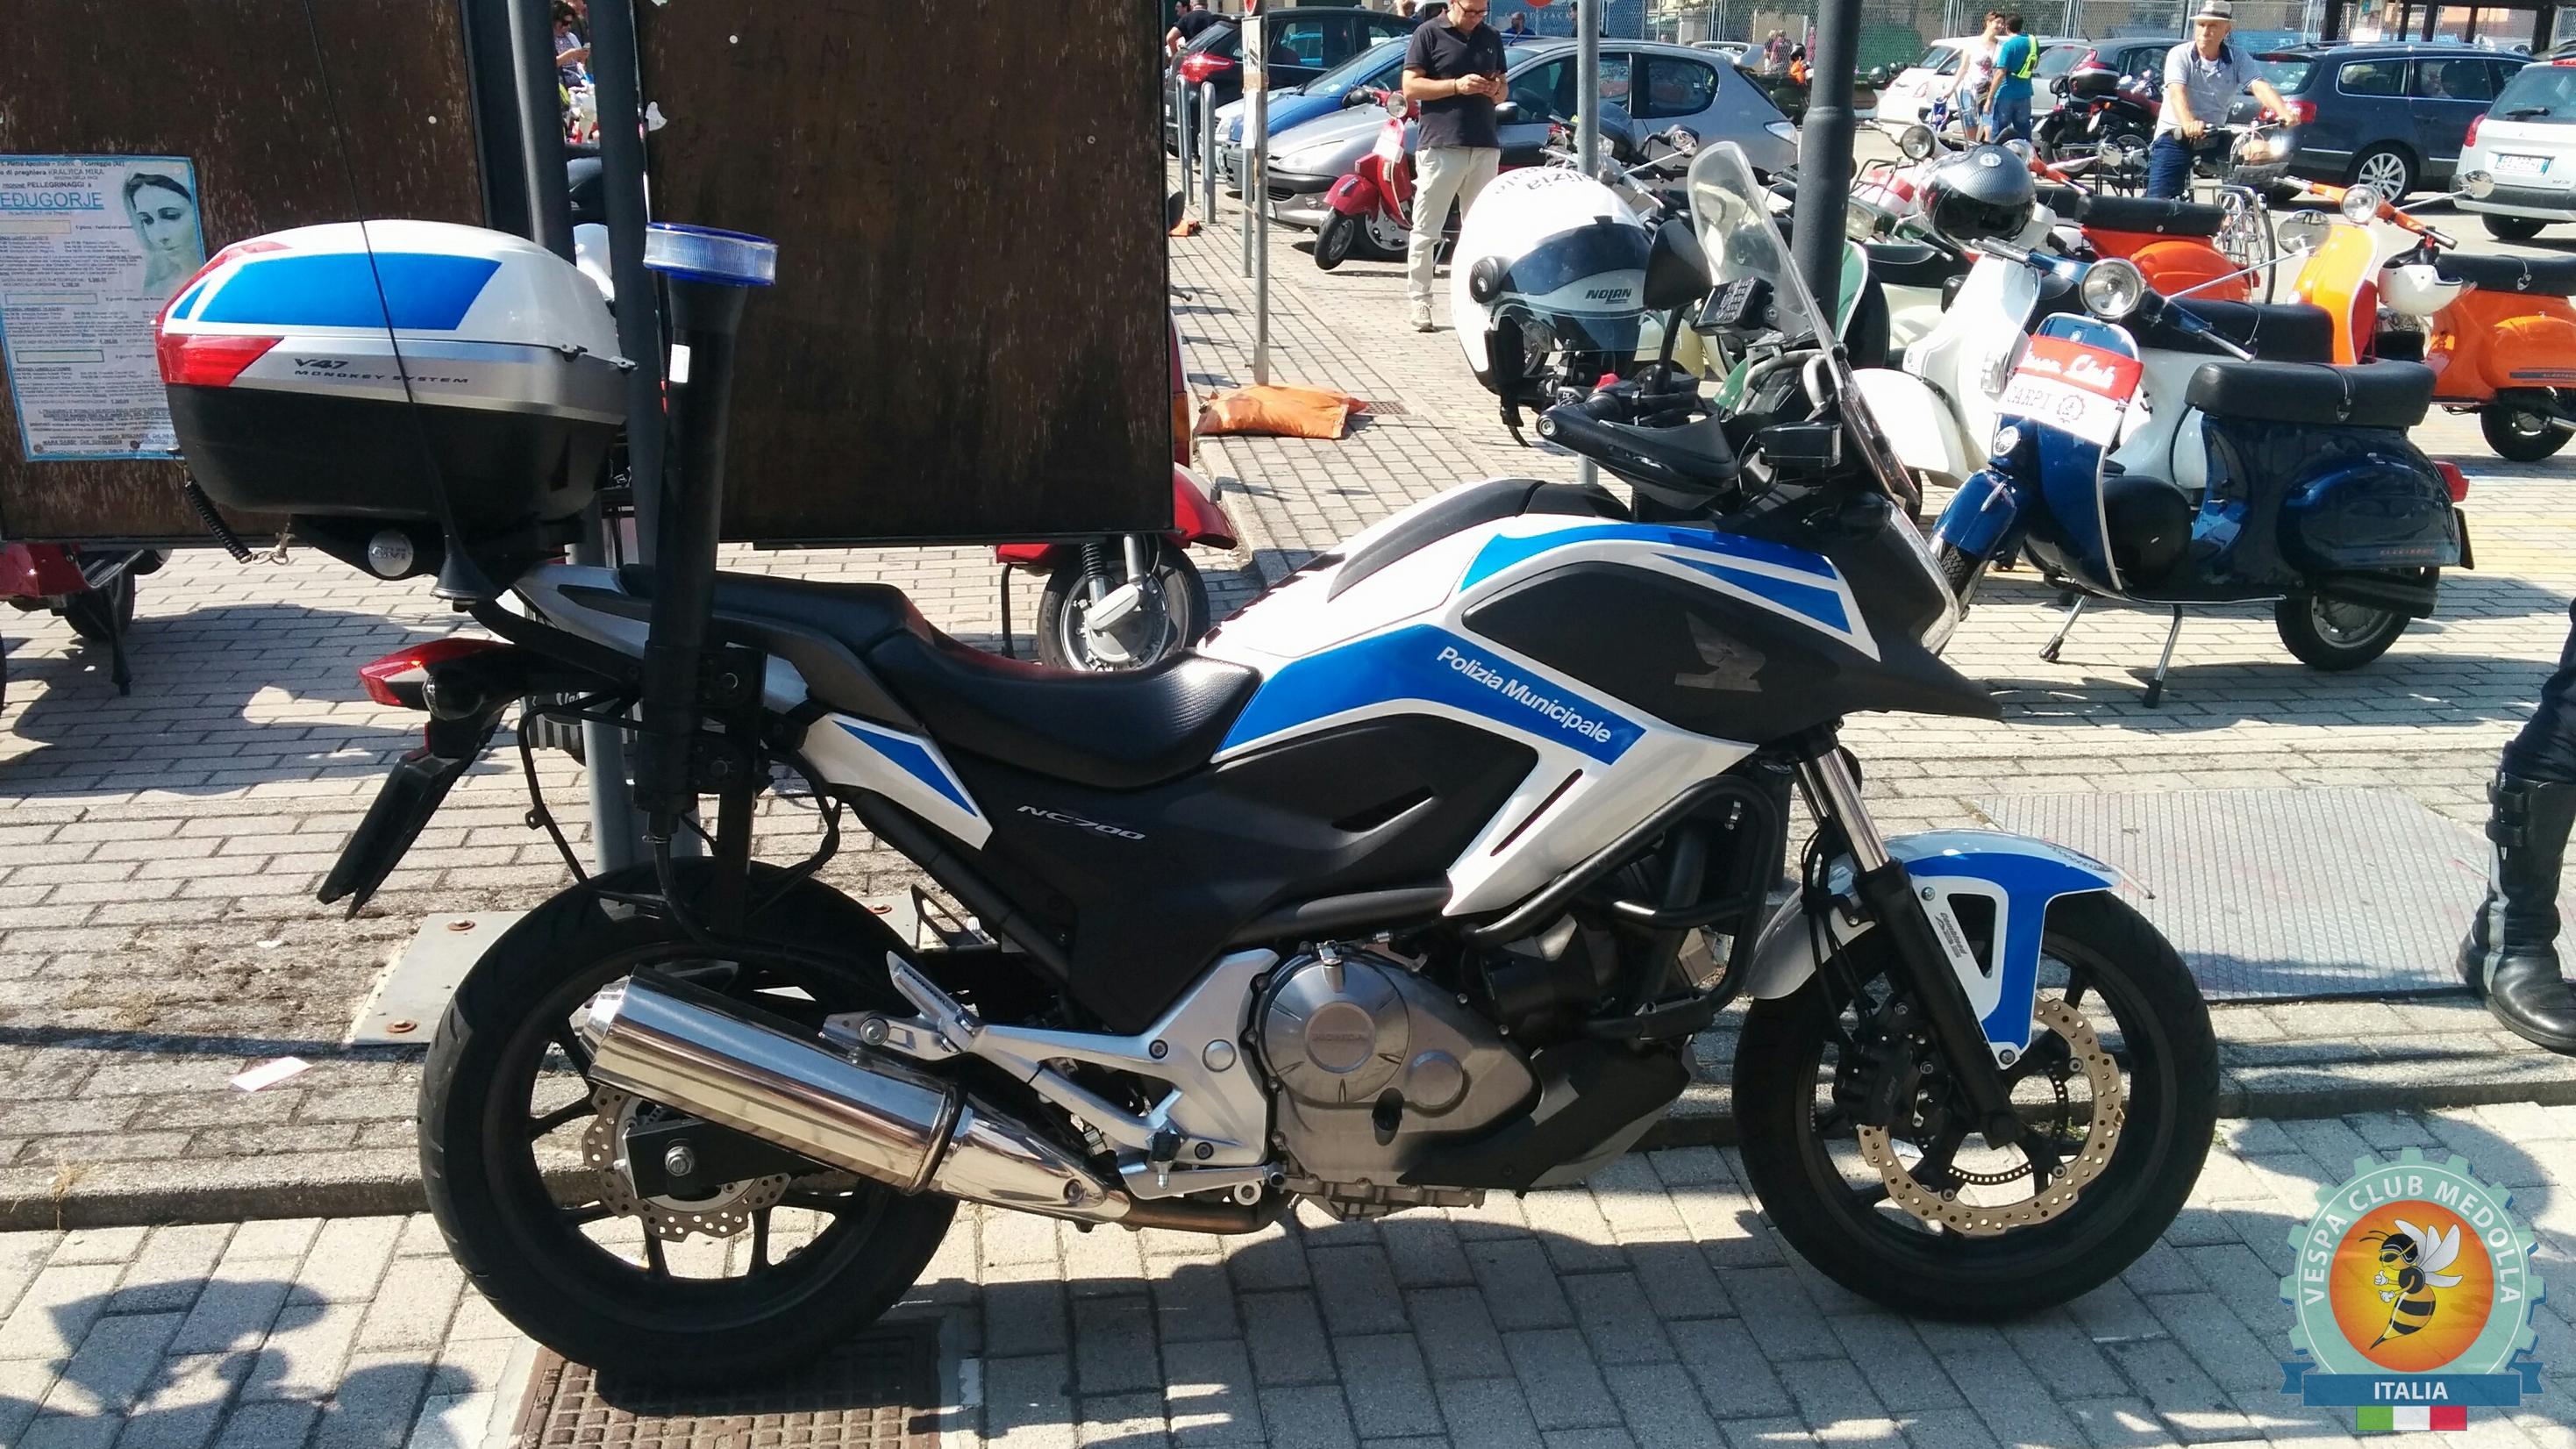 Honda NC700 polizia municipale